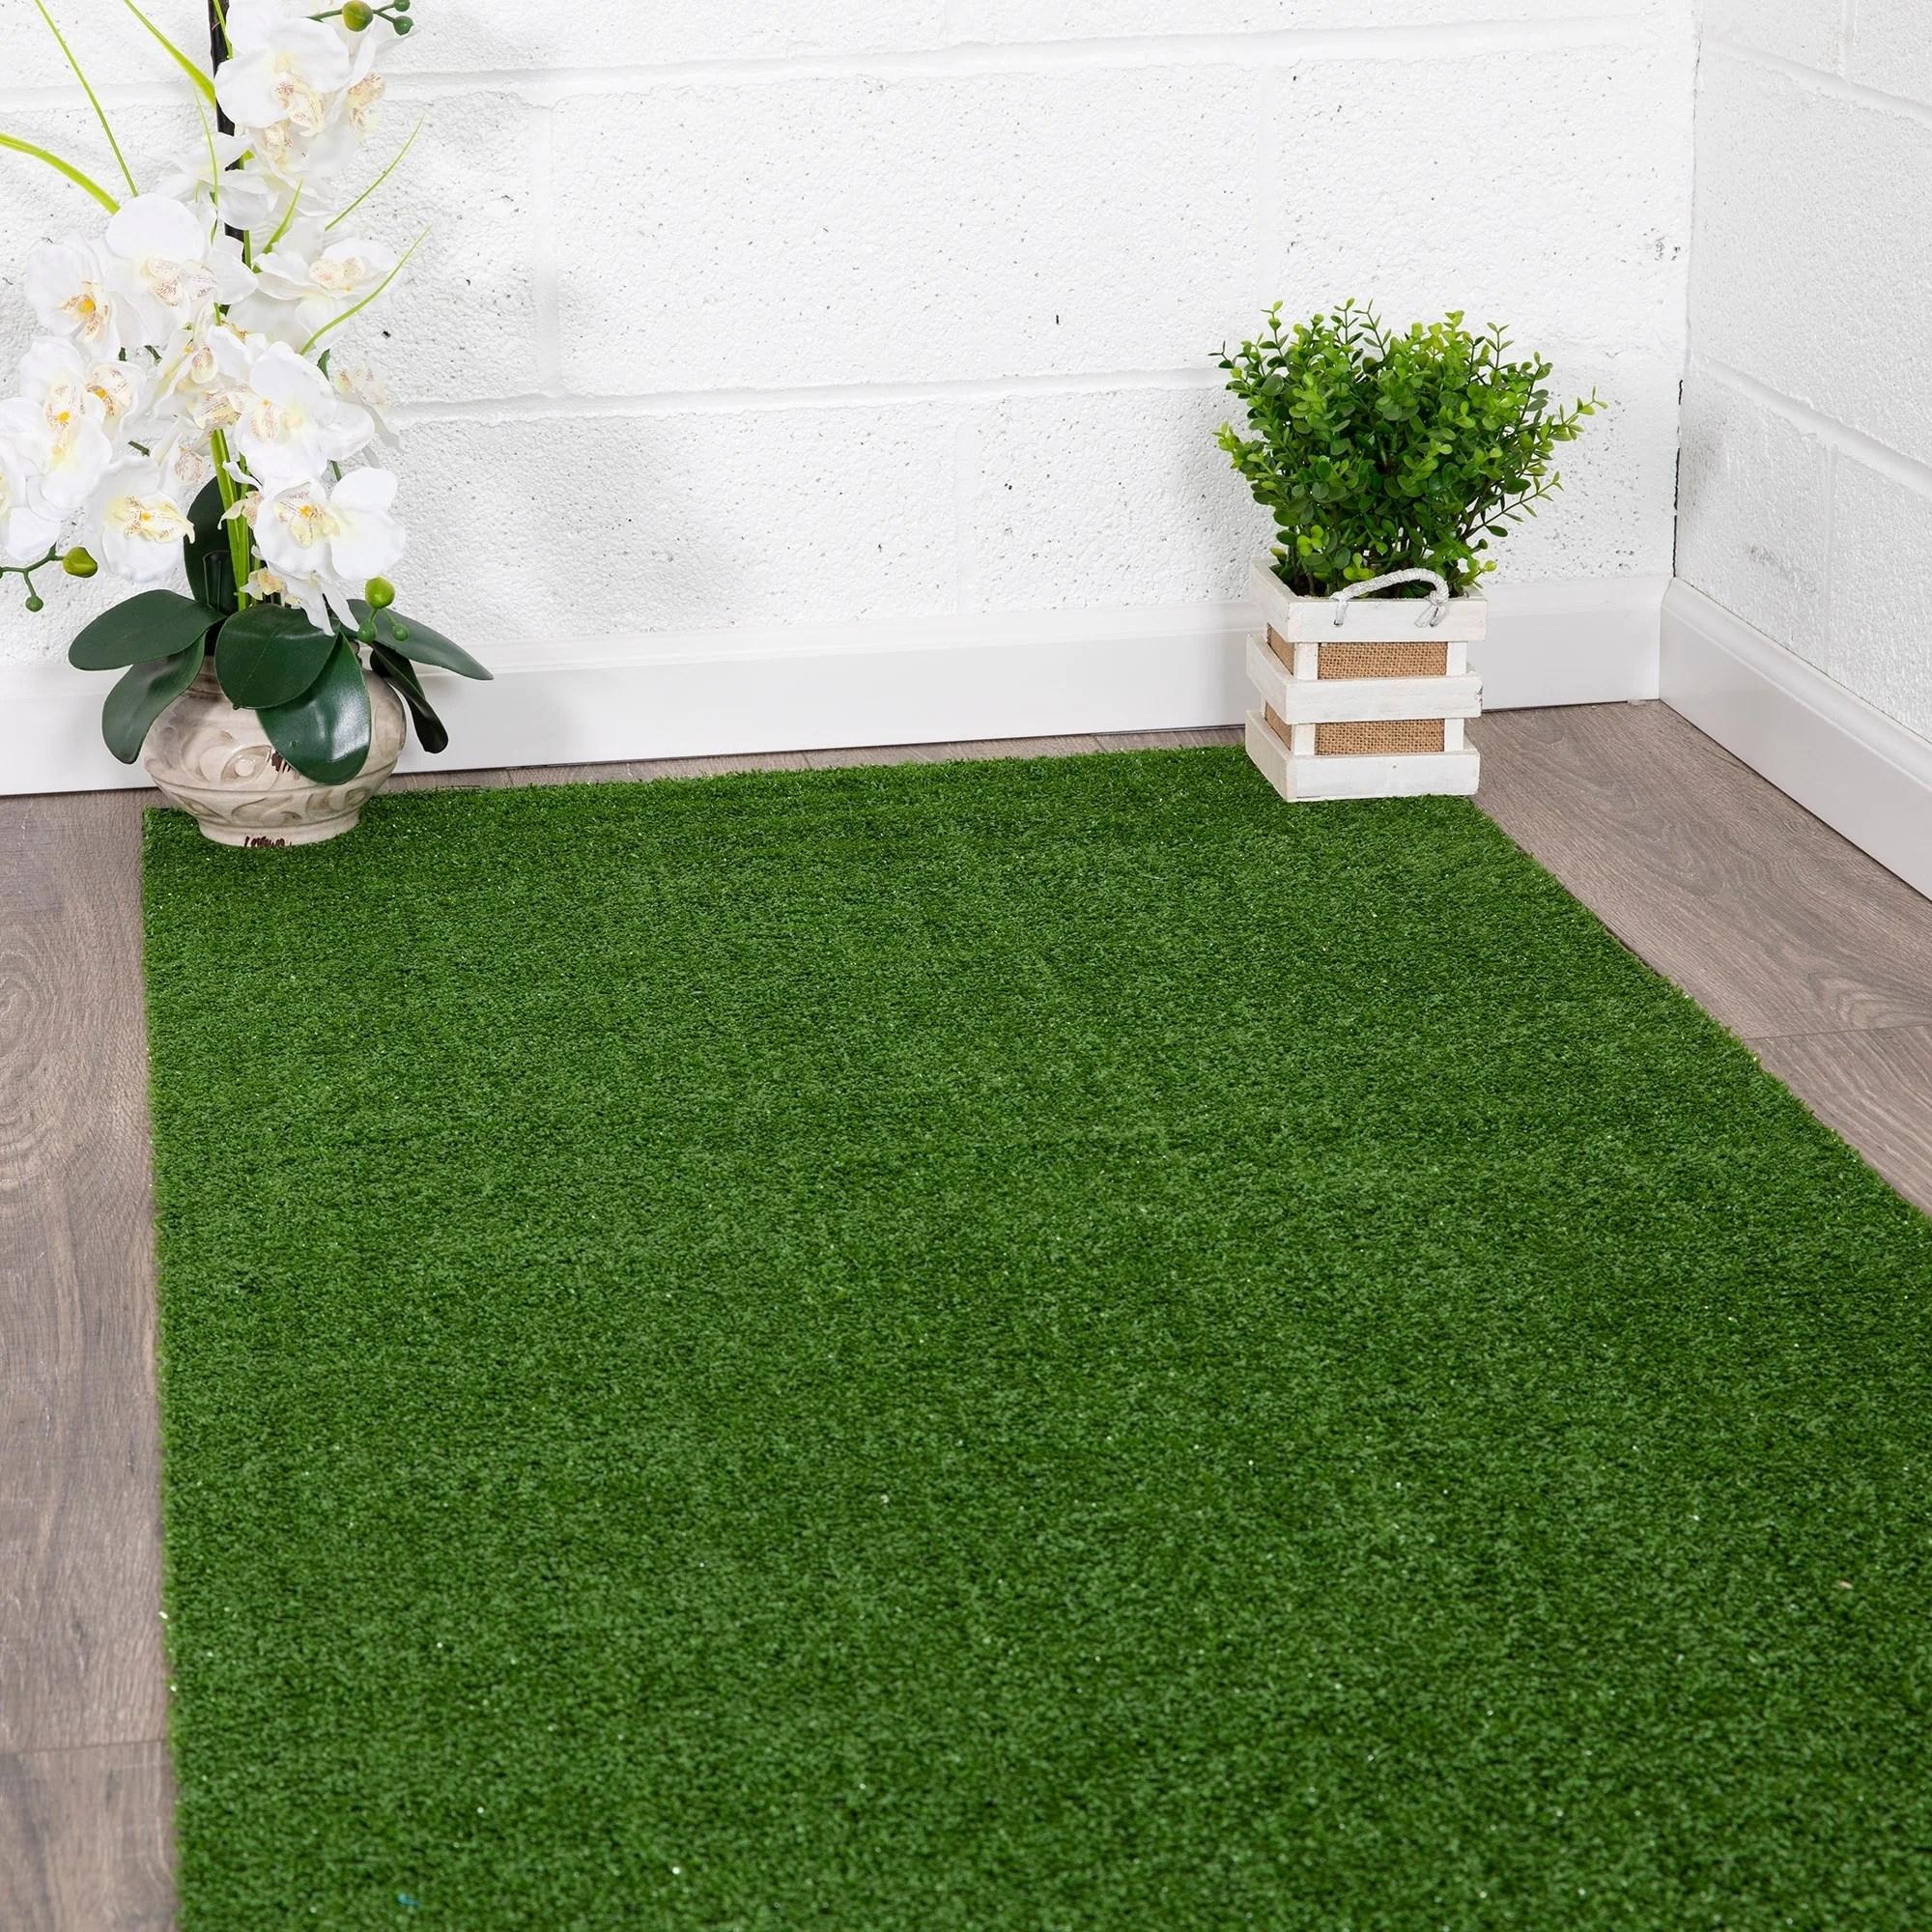 ottomanson evergreen indoor outdoor artificial grass turf area rug